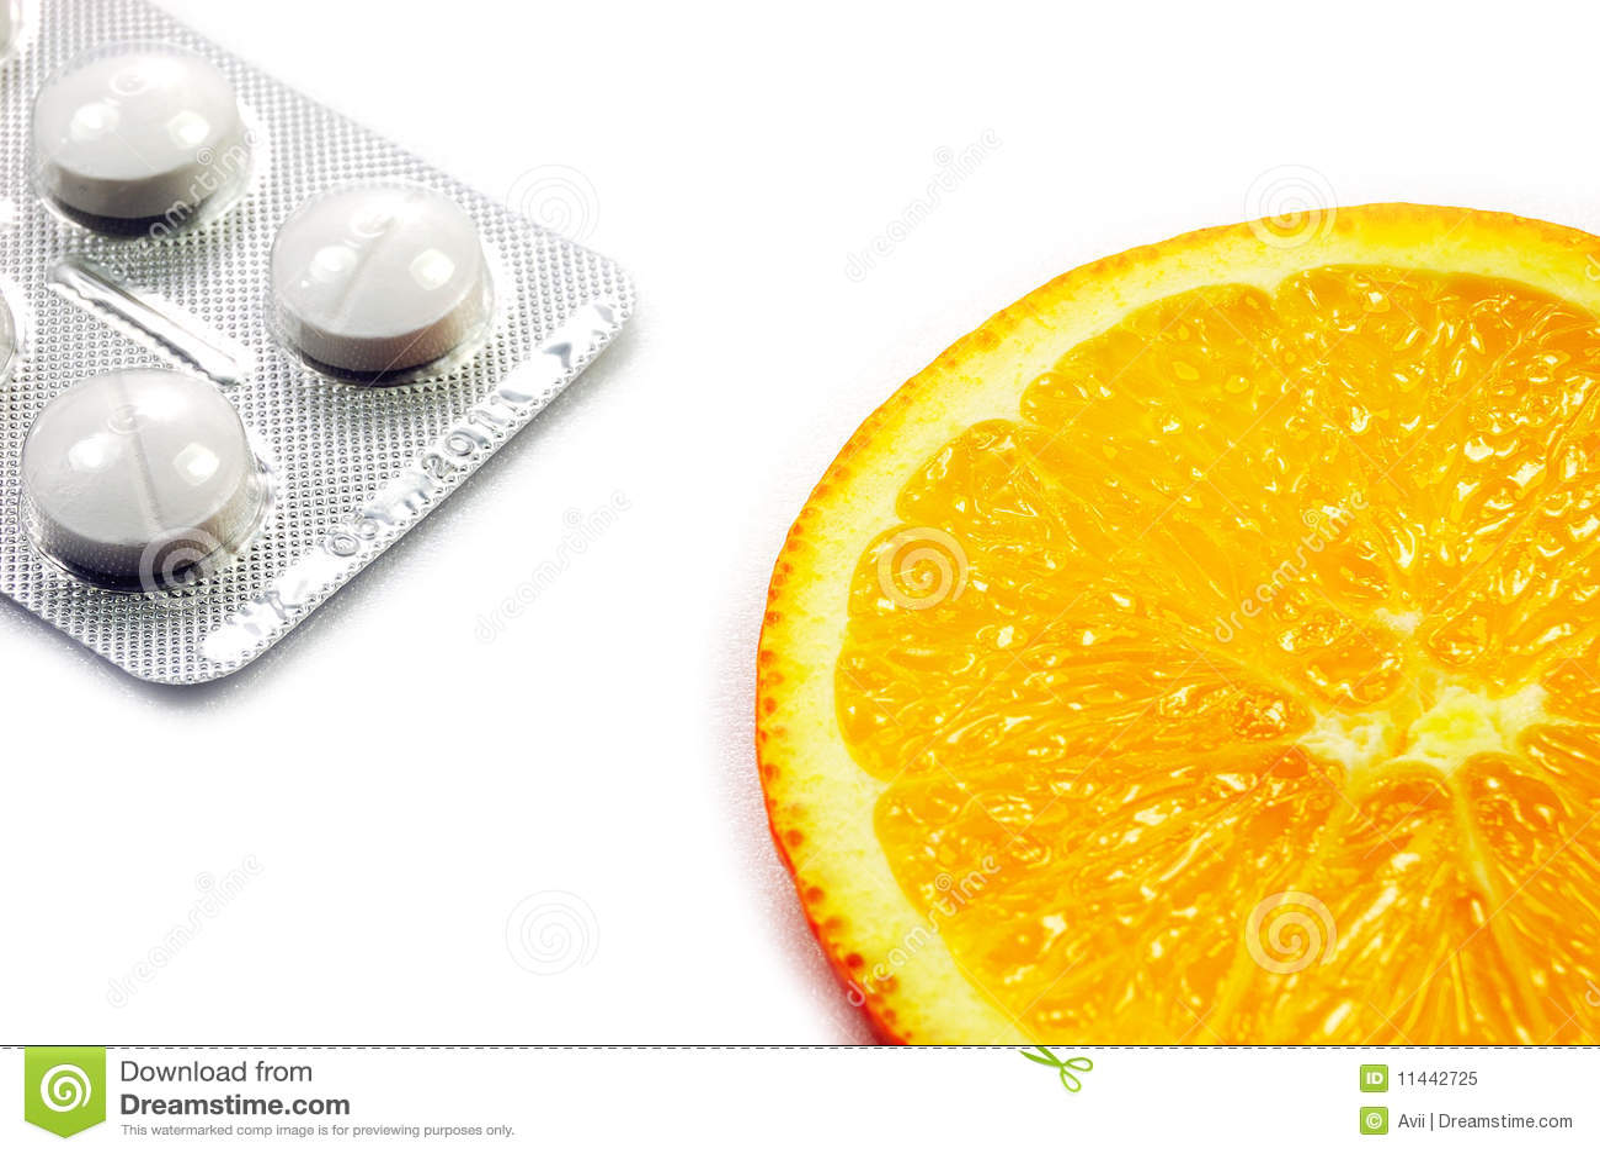 Natural Orange Fruit Vs Chemical Medicine Royalty Free Stock Photo